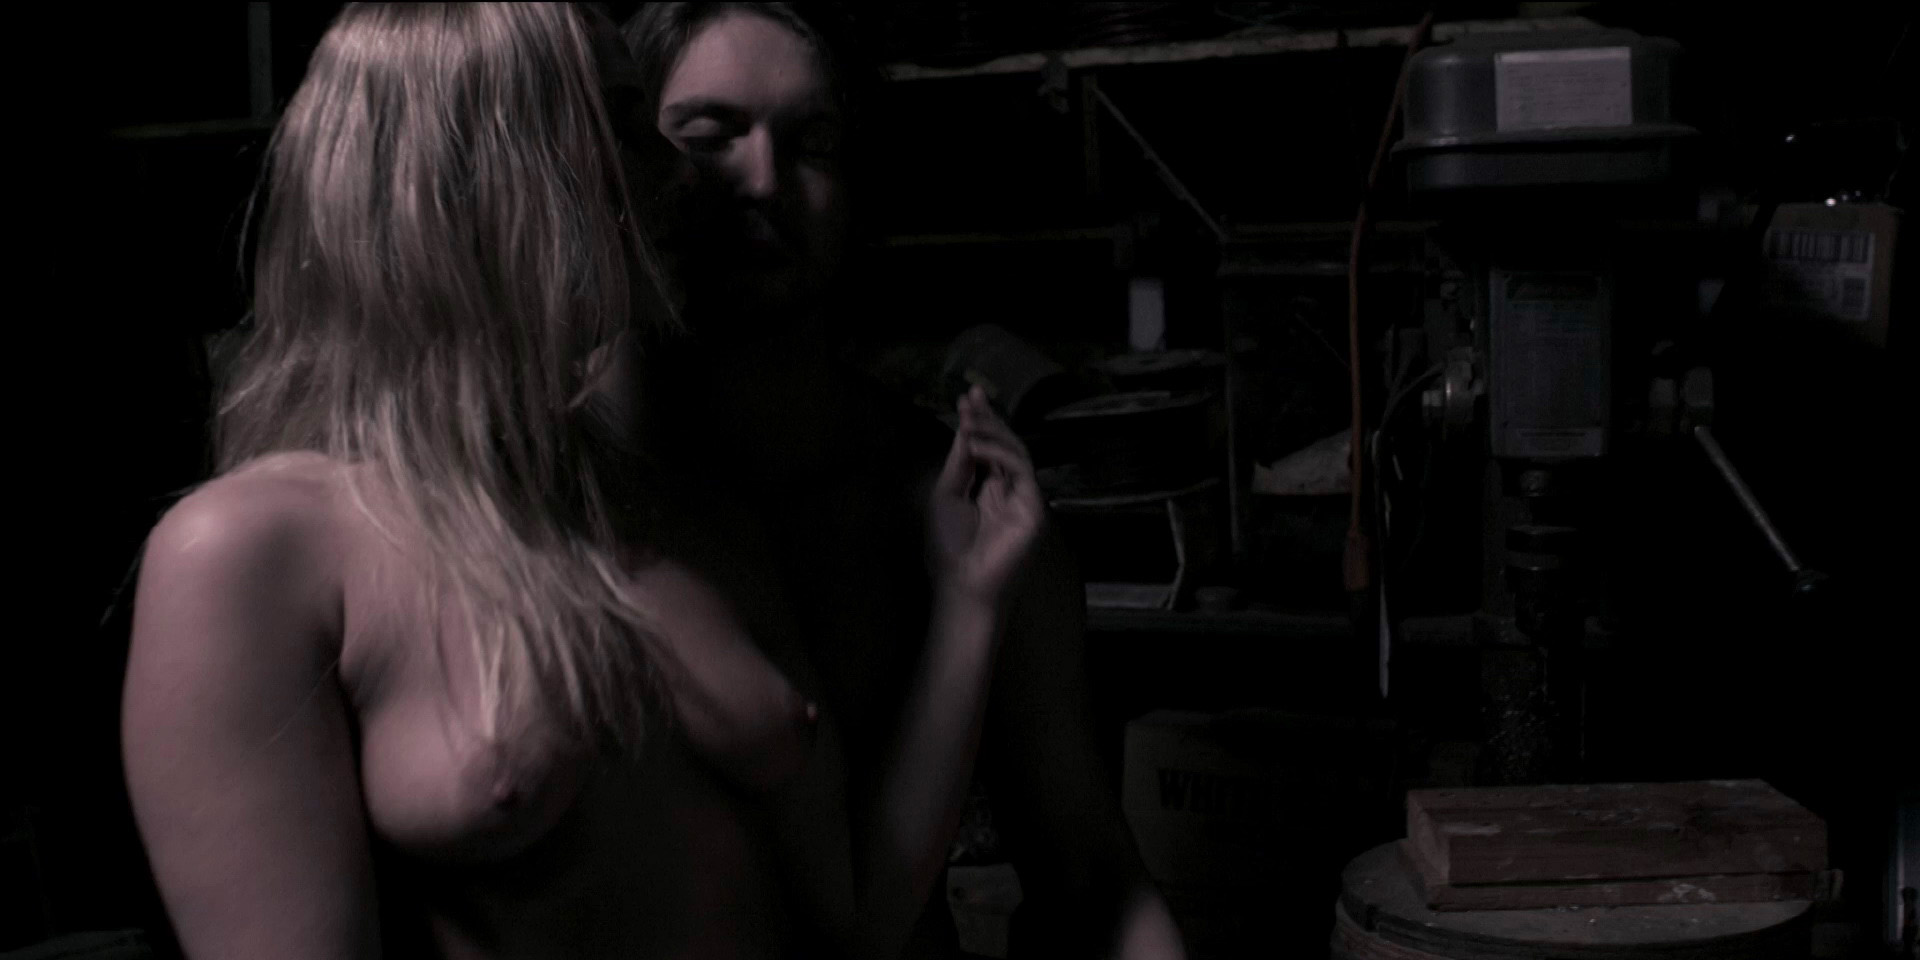 Sex scene waldron shawna